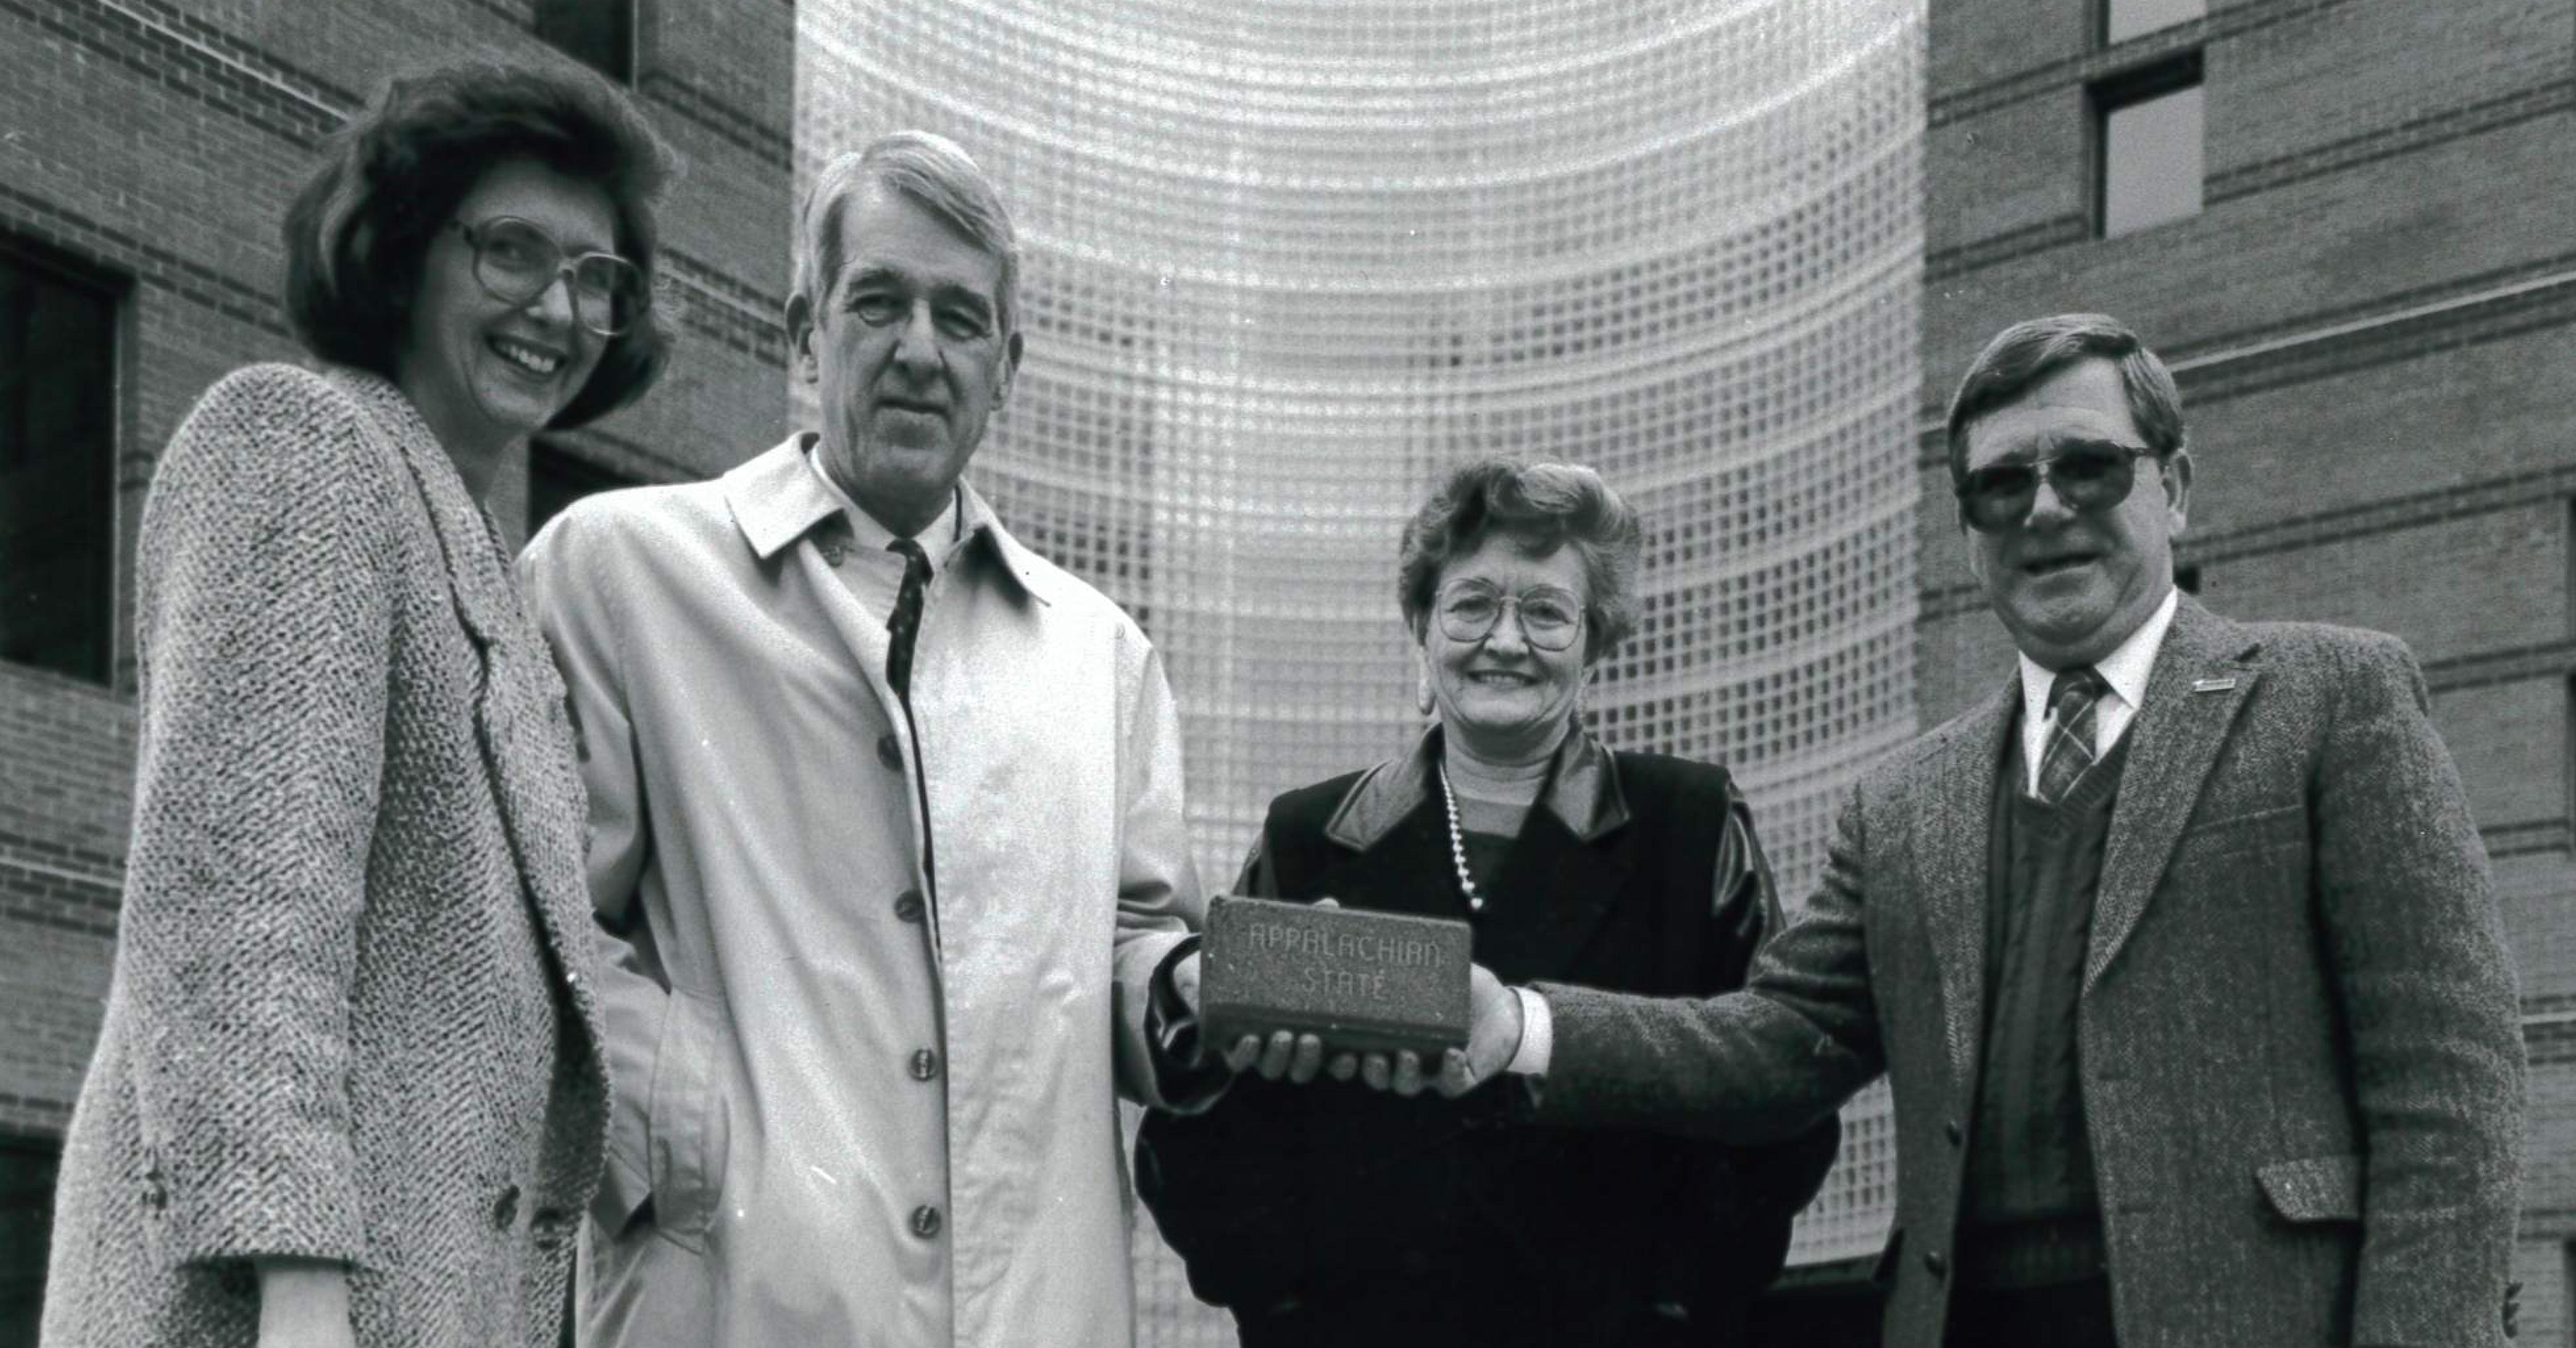 Alumni Wall - Brick Campaign - Dean Davis, second from left